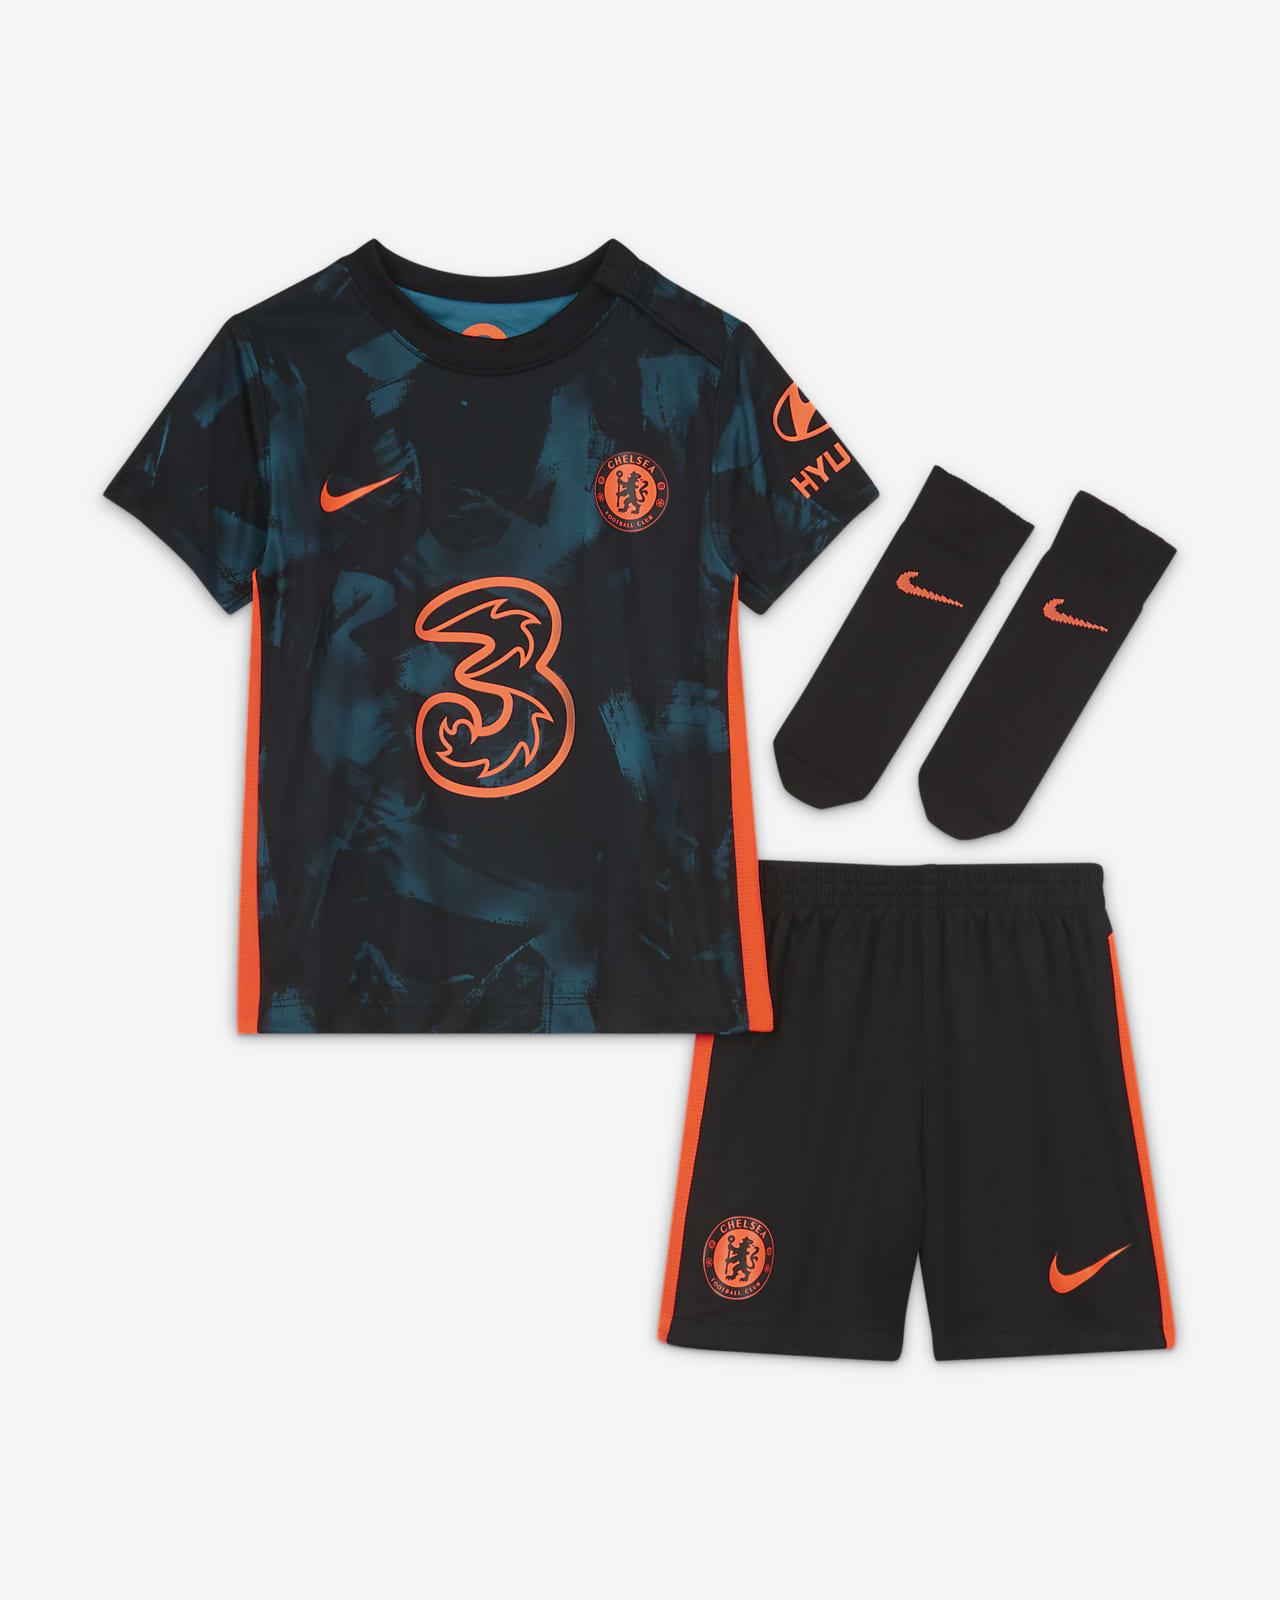 Chelsea F.C. 2021/2022 Third Baby & Toddler Nike Dri-FIT Kit